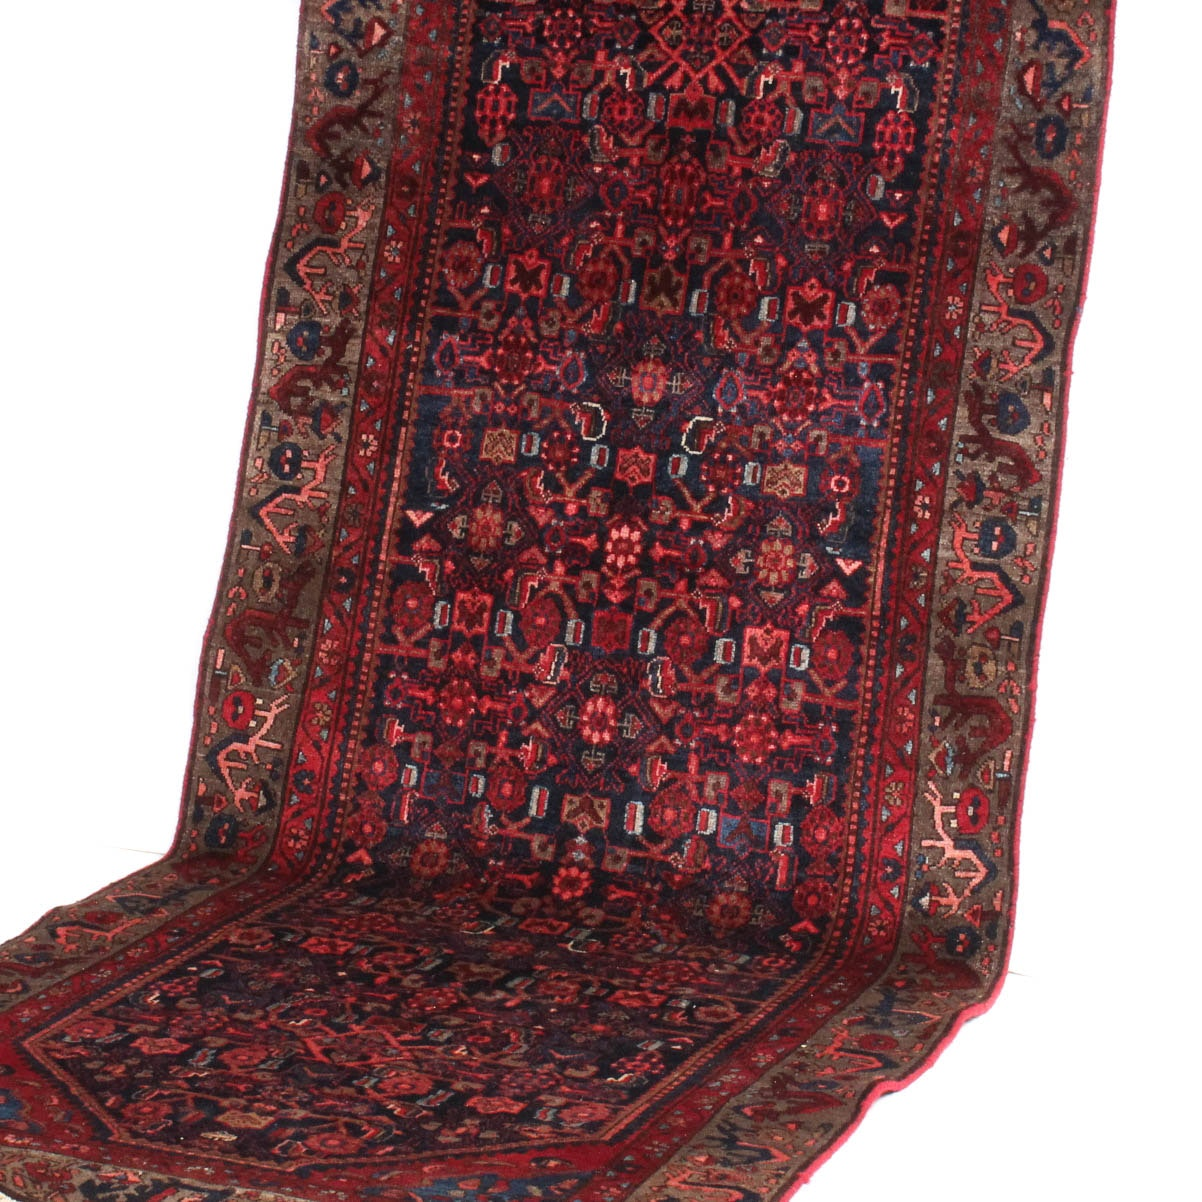 4' x 9' Vintage Hand-Knotted Persian Lilihan Sarouk Rug Runner